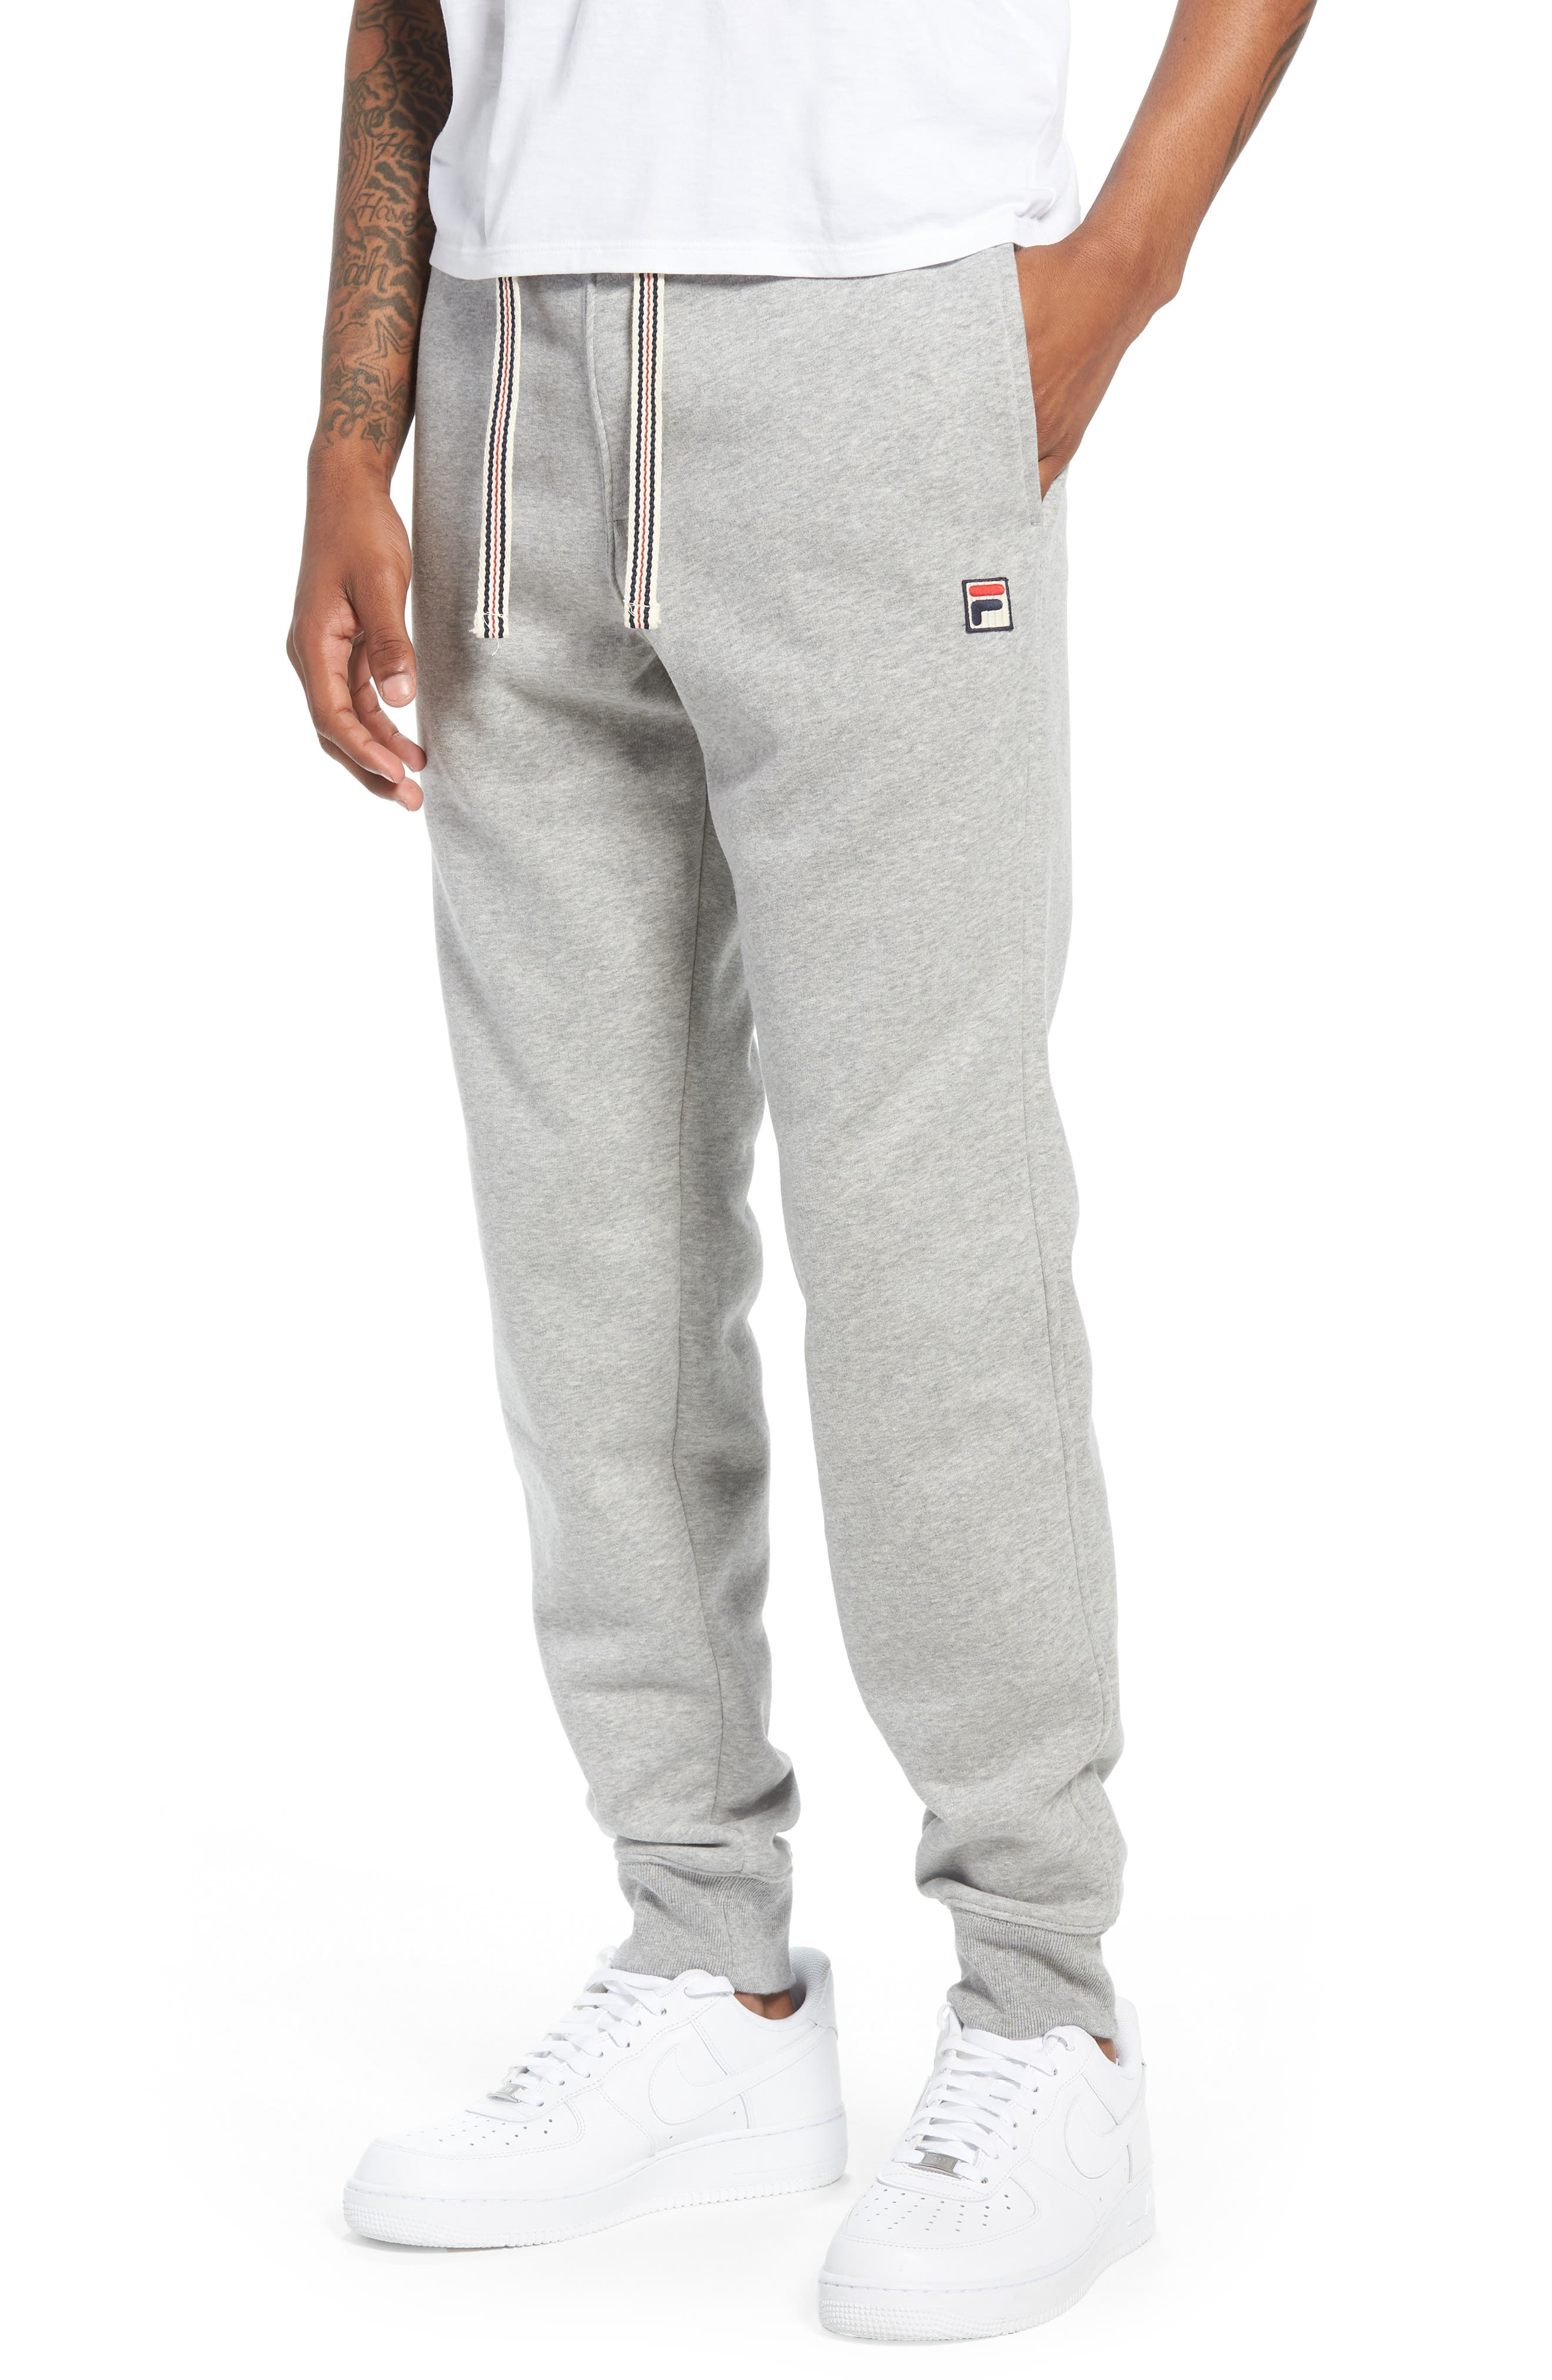 FILA Jogger Pants